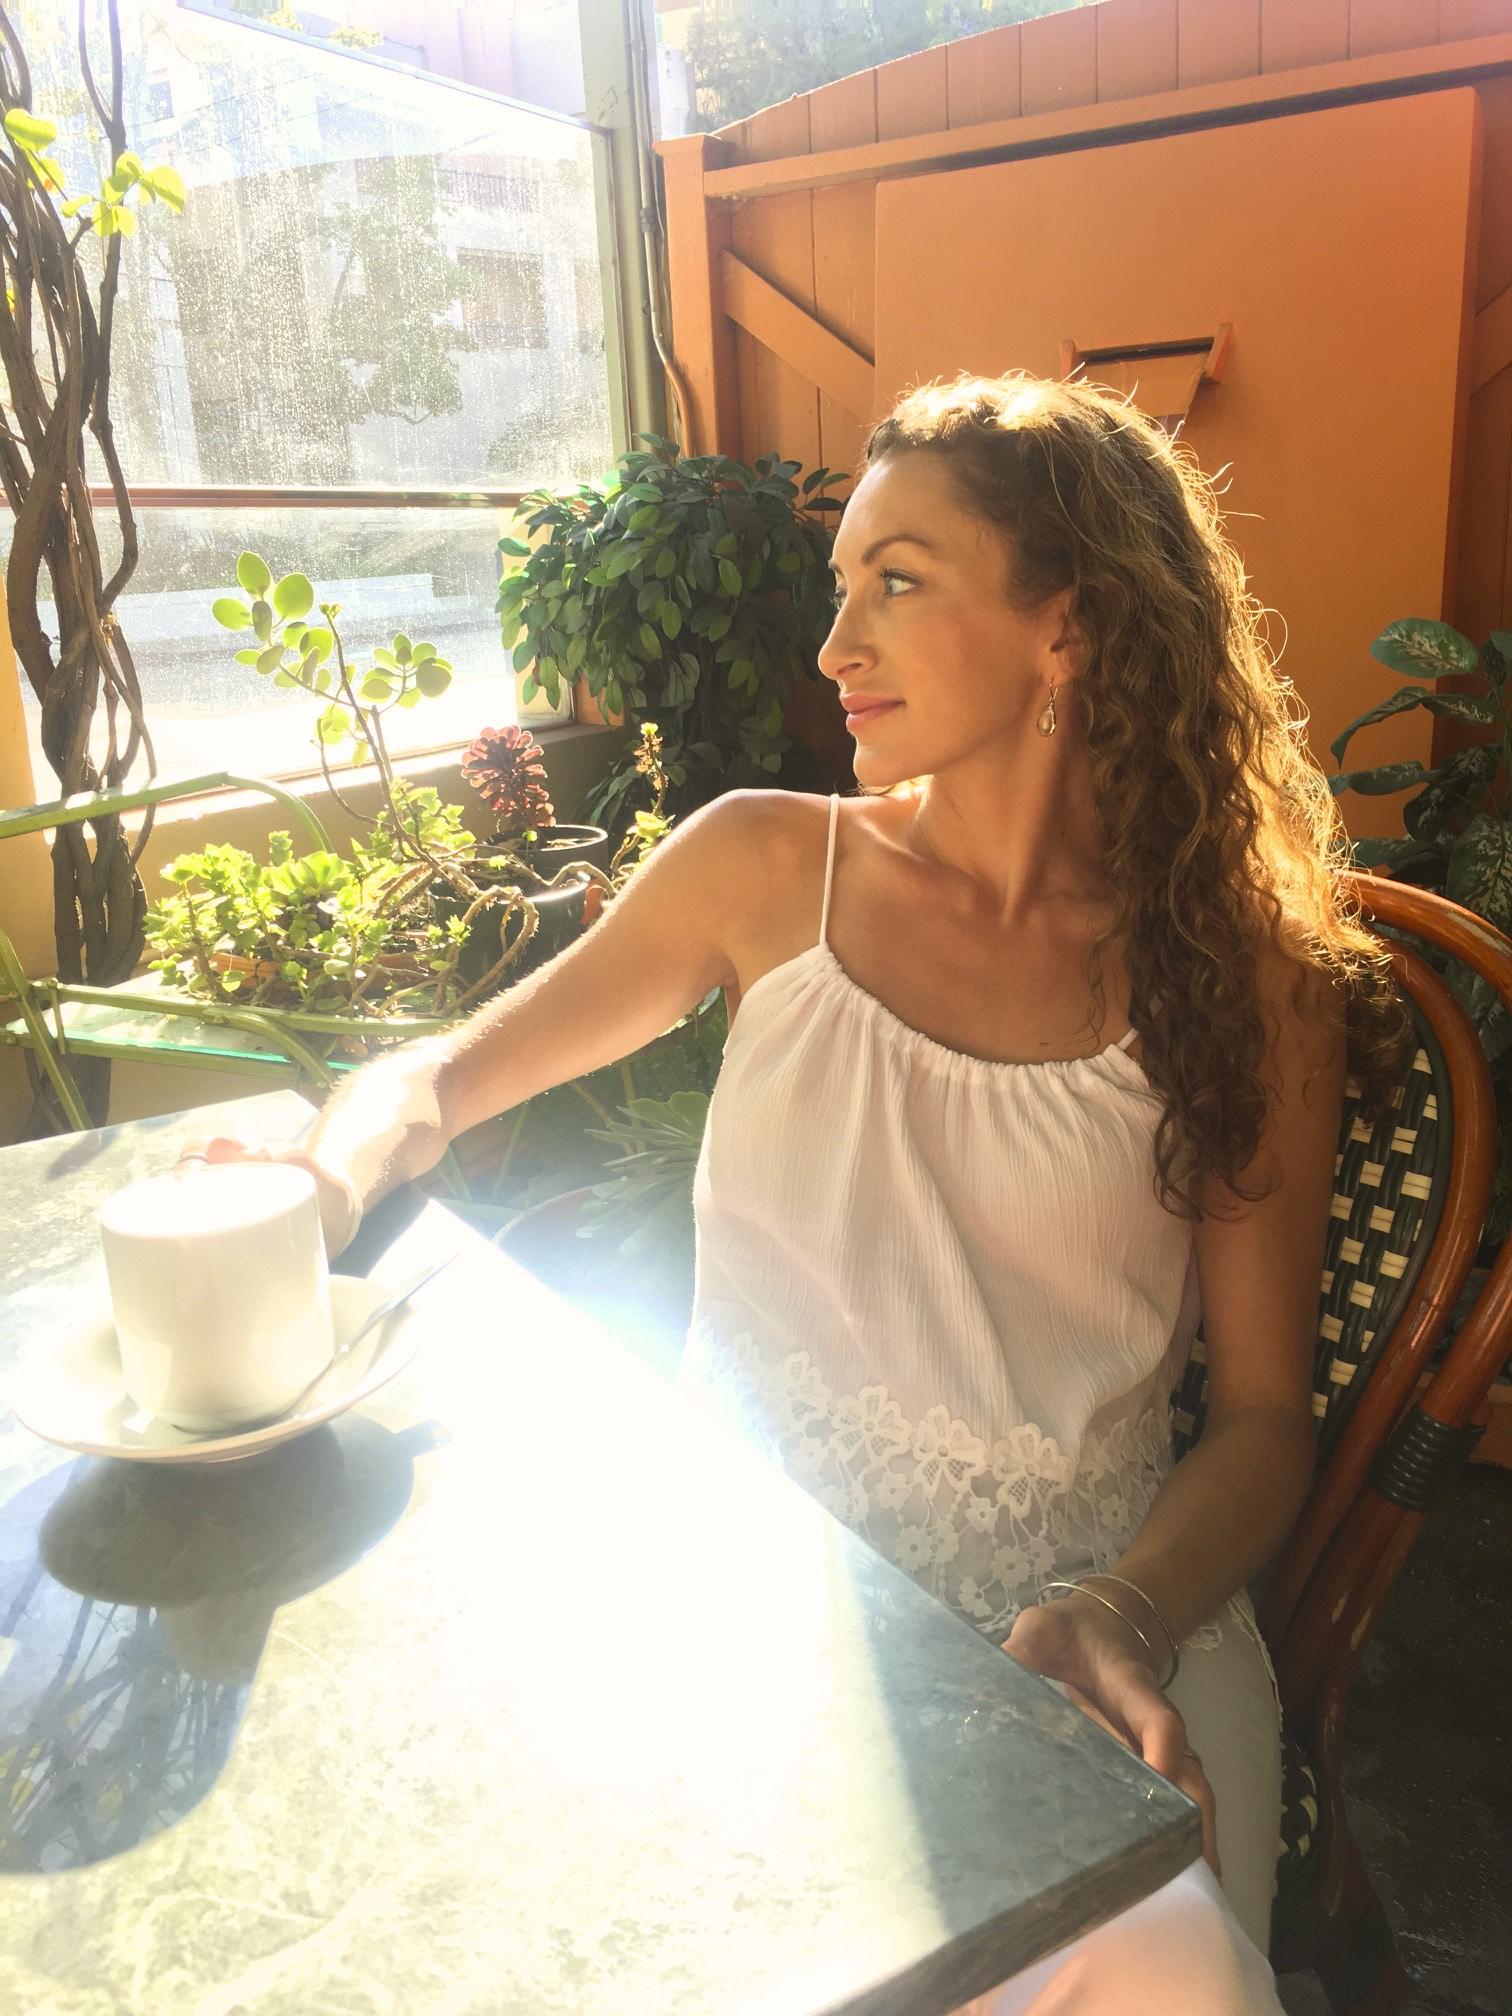 Gorgeous Lattes at LIterati Cafe, Santa Monica